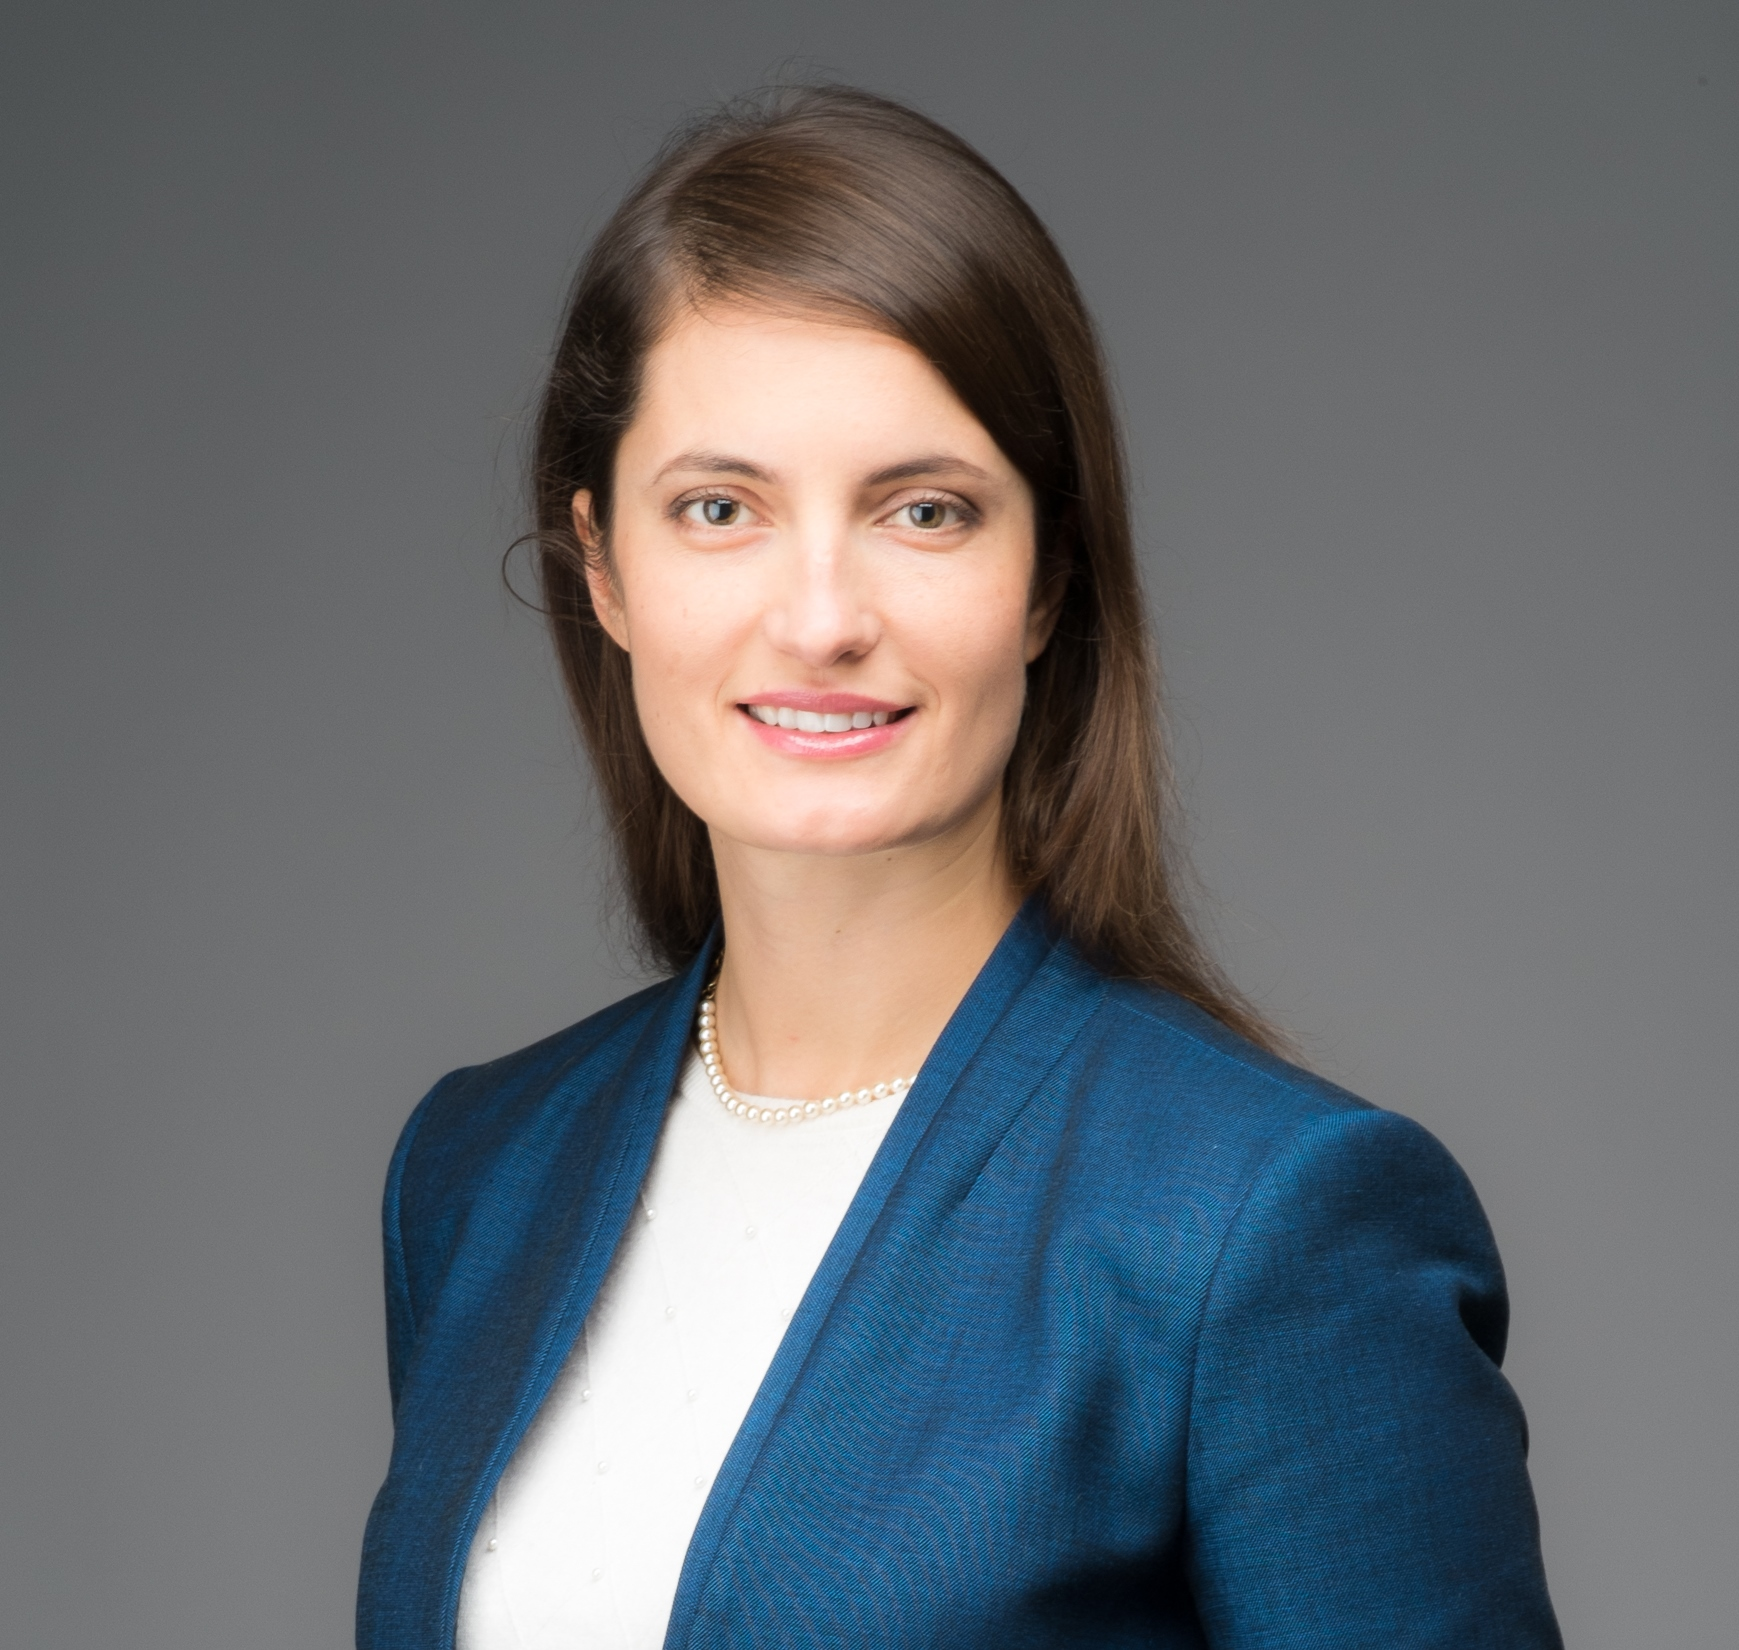 Ramona Miglane